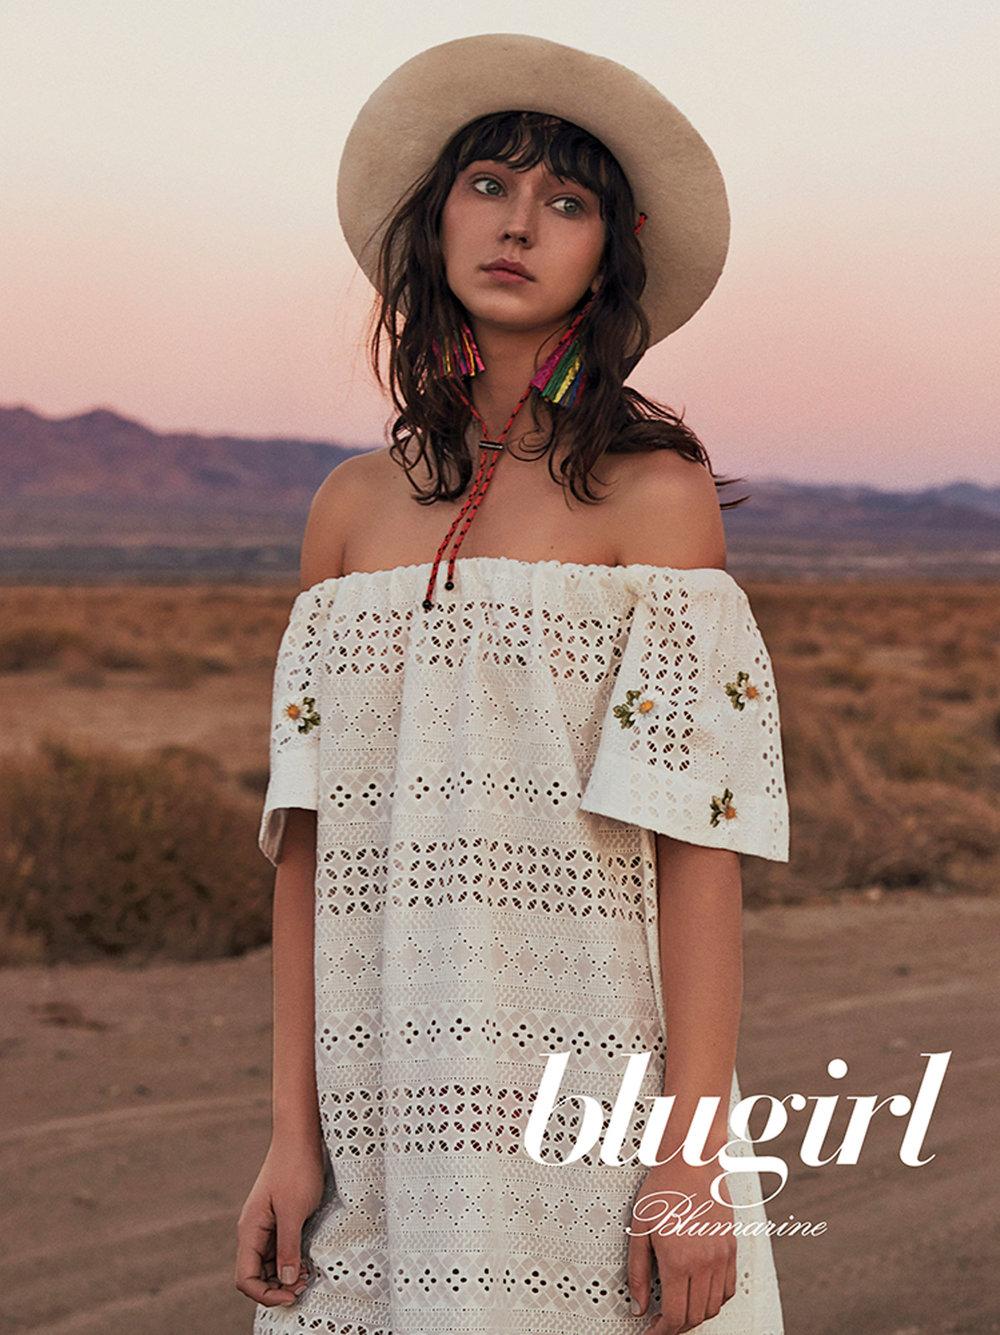 17SS-Blugirl-Campaign-LTE-036.jpg